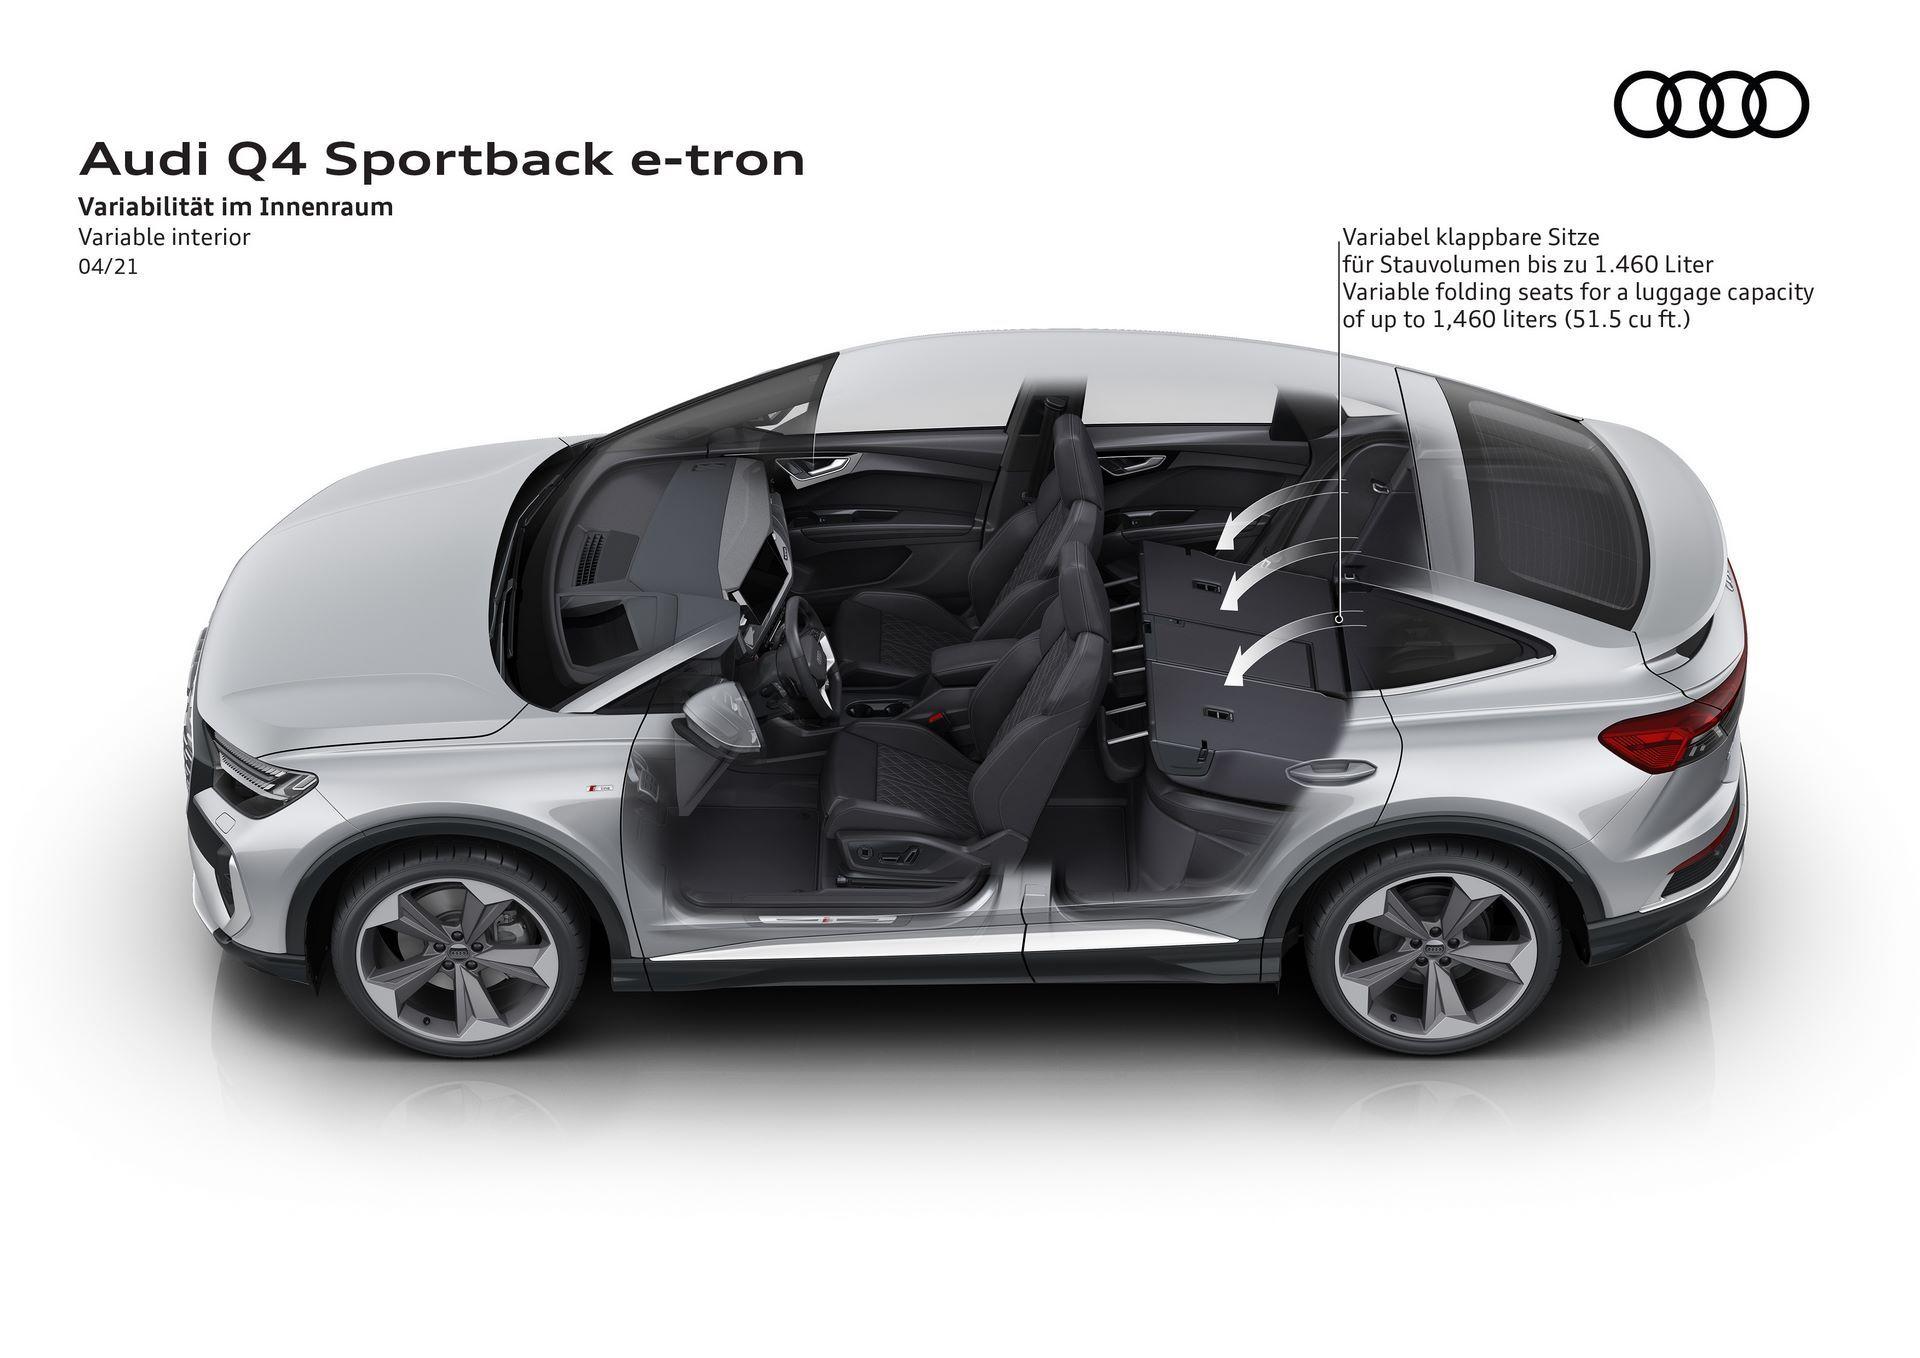 Audi-Q4-e-tron-and-Q4-e-tron-Sportback-140